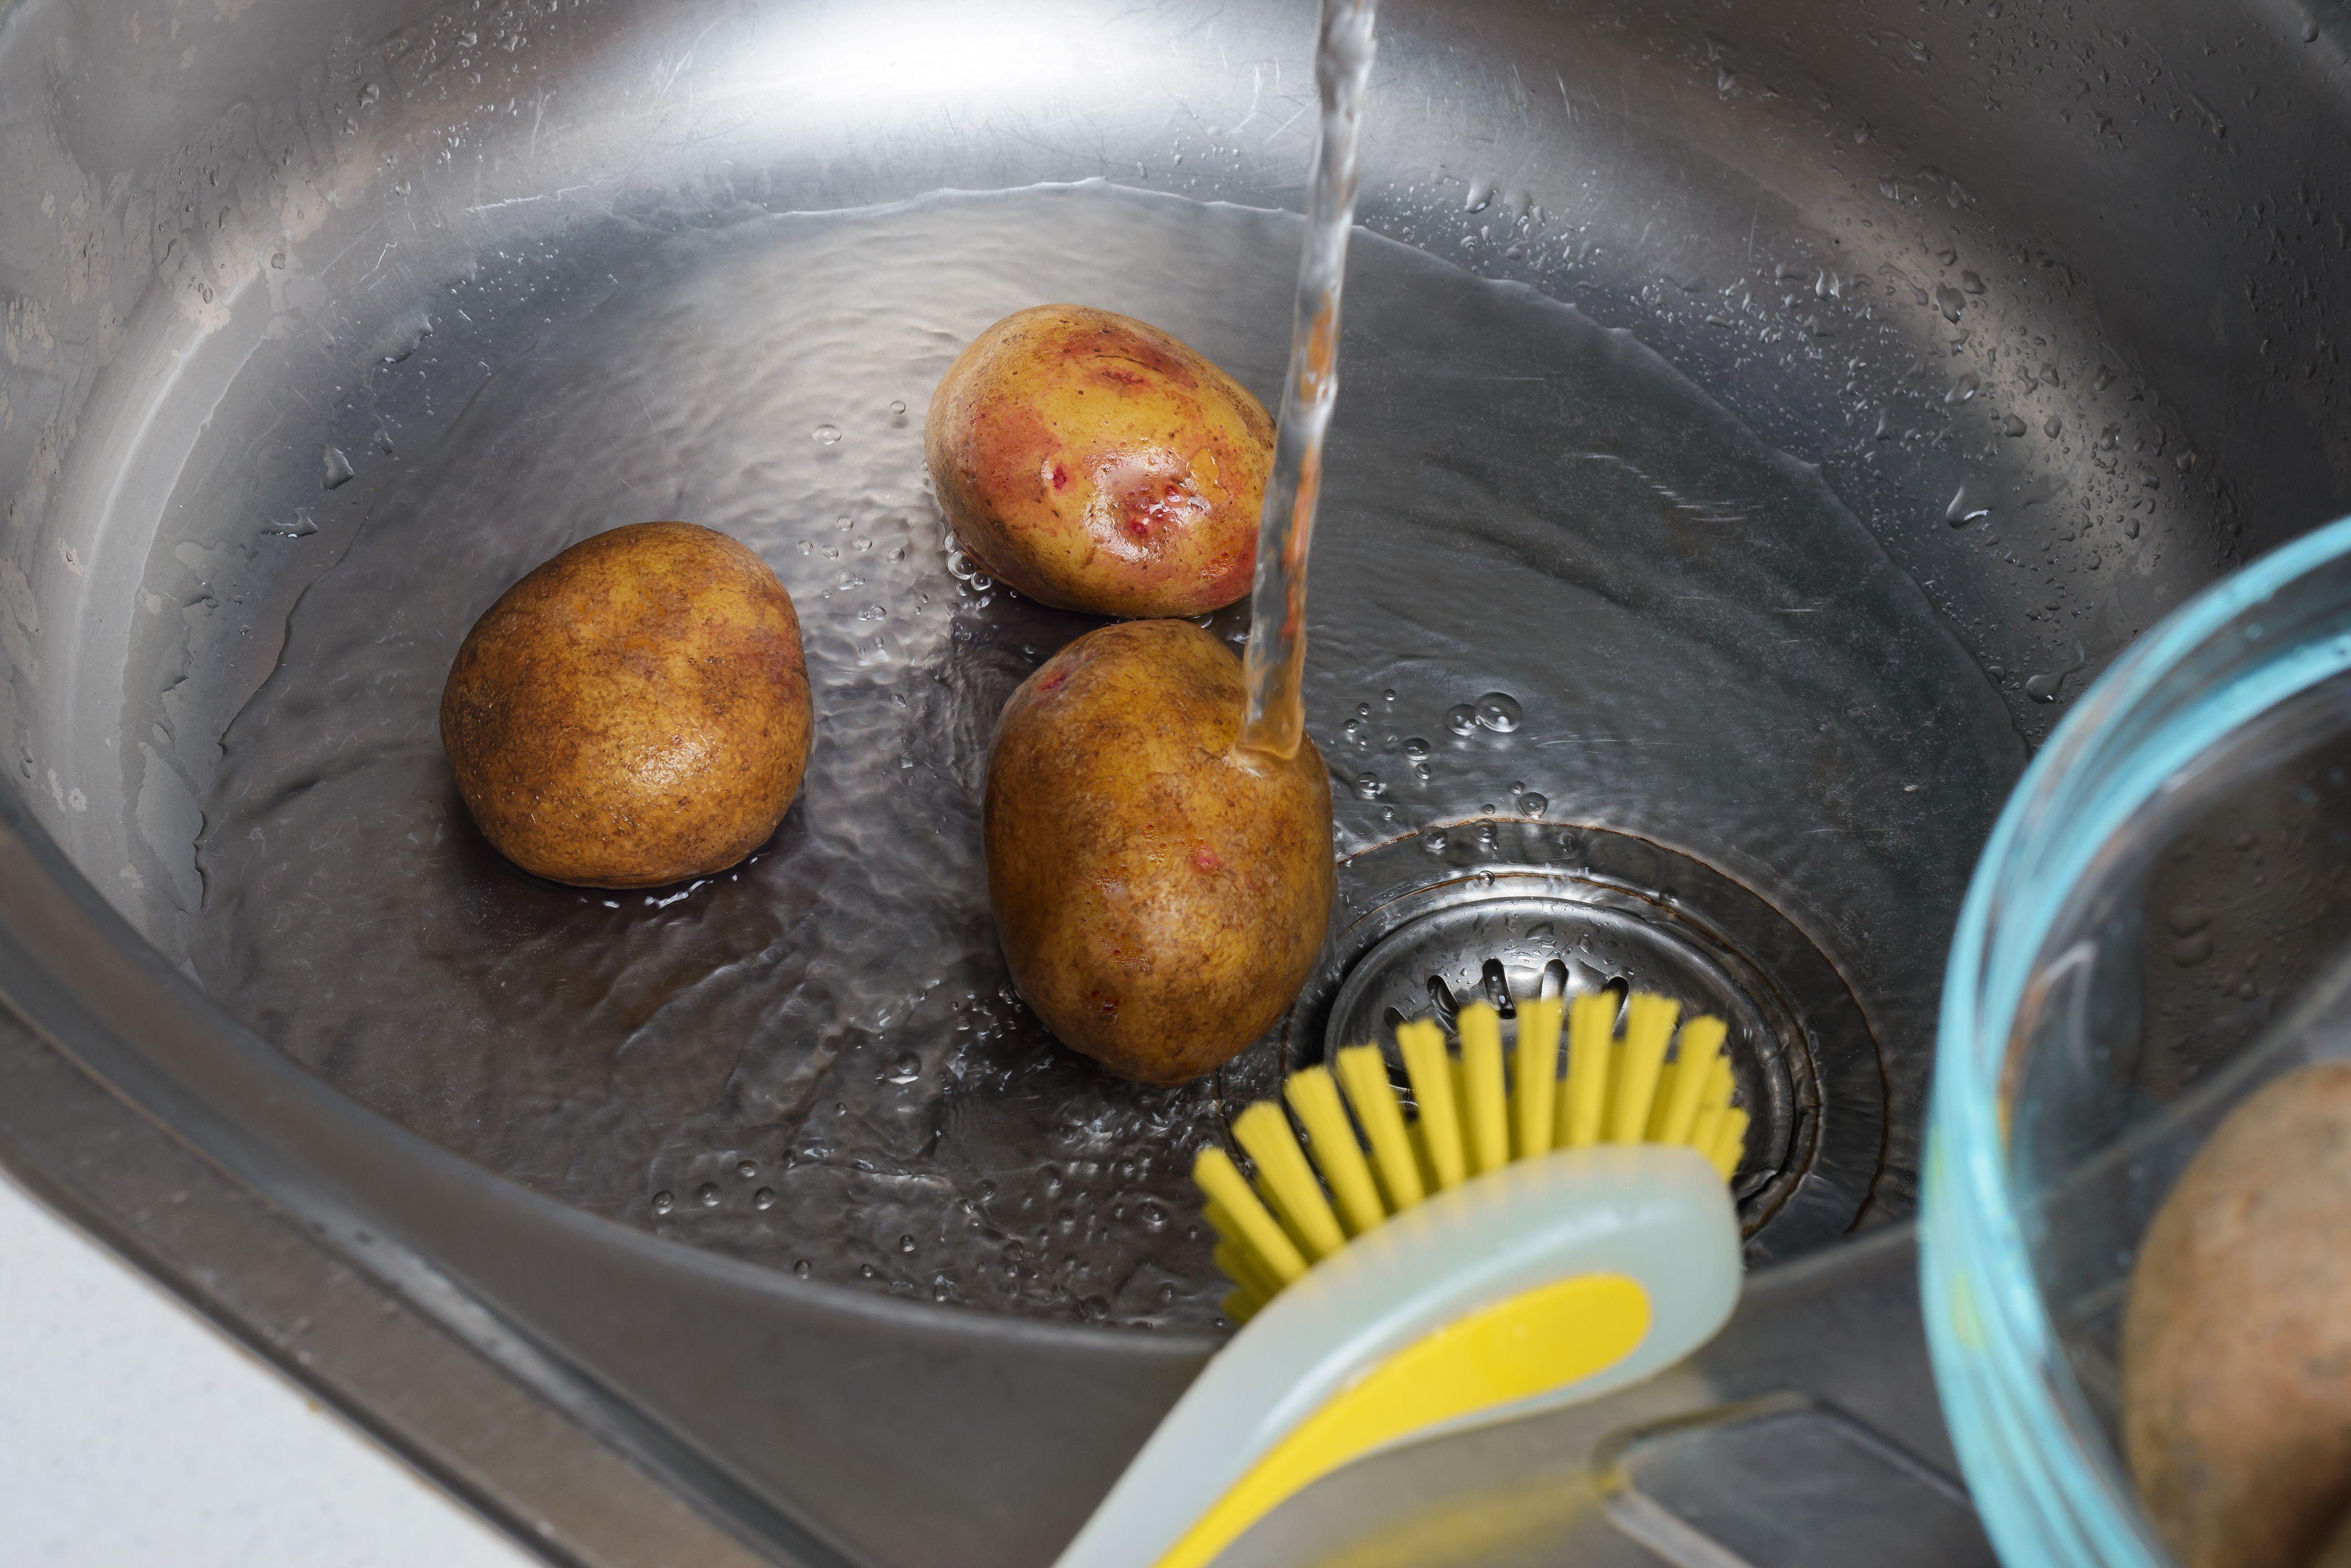 Scrub potatoes